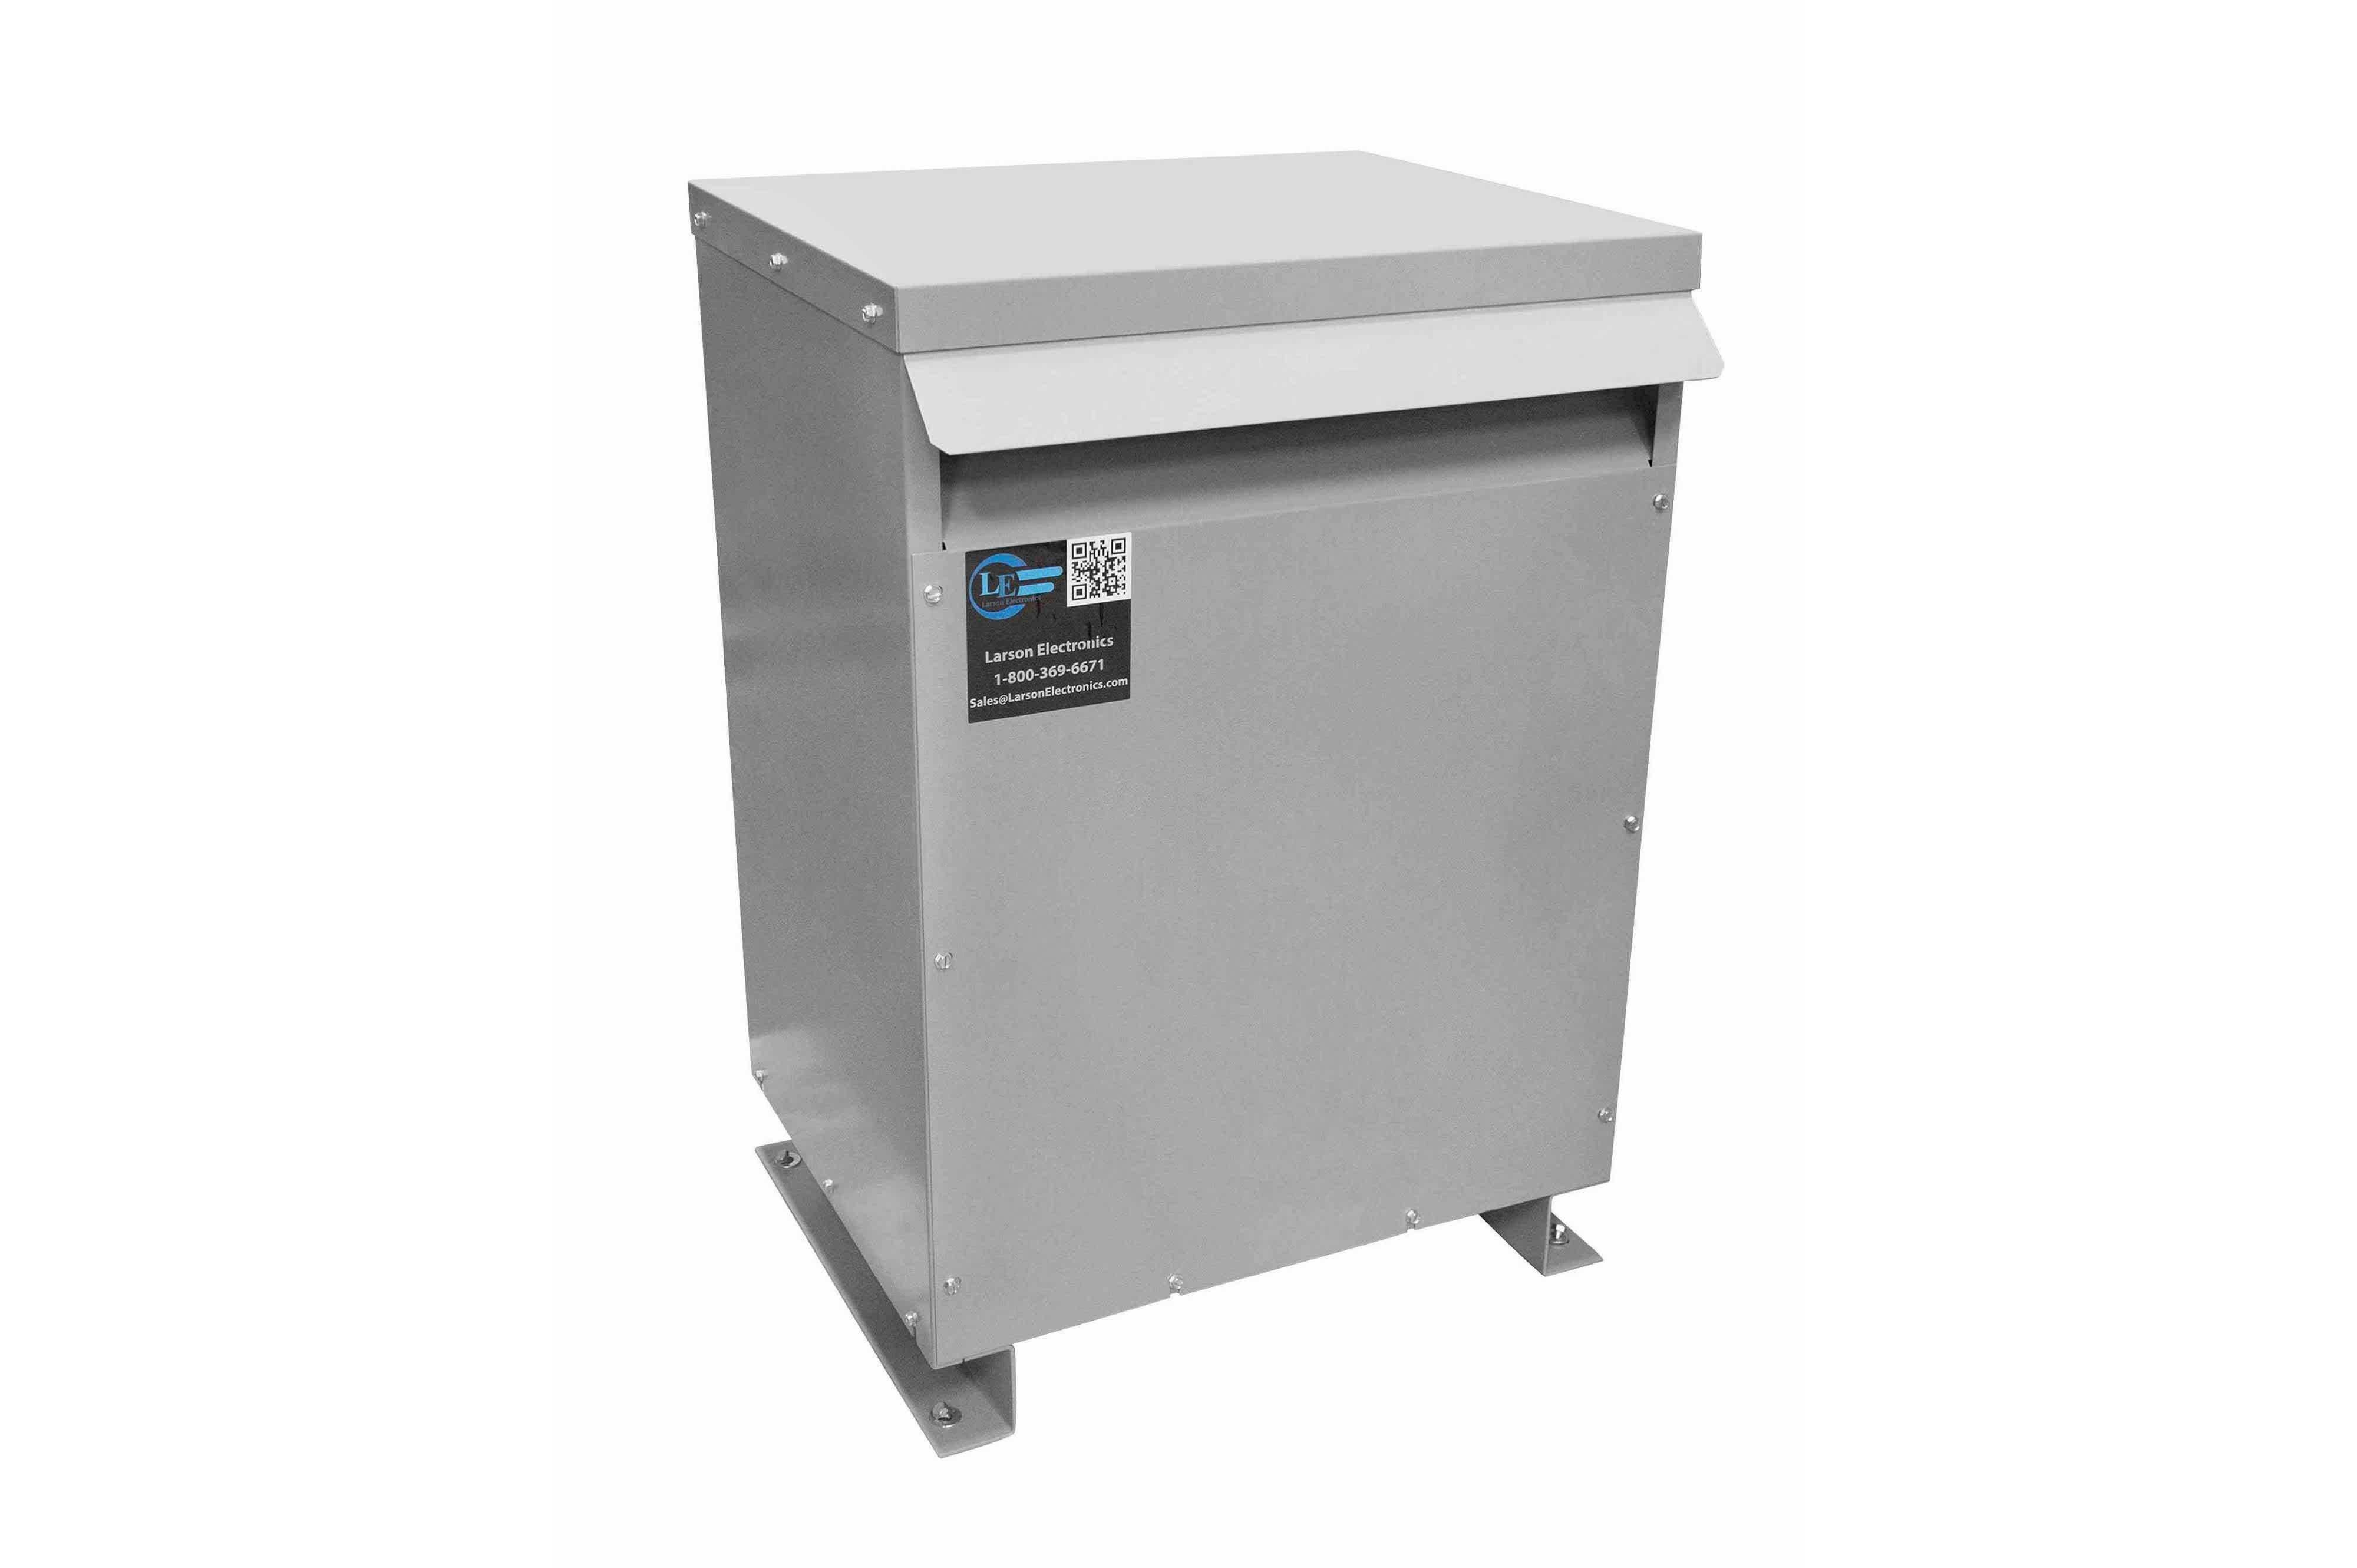 80 kVA 3PH Isolation Transformer, 230V Wye Primary, 208V Delta Secondary, N3R, Ventilated, 60 Hz